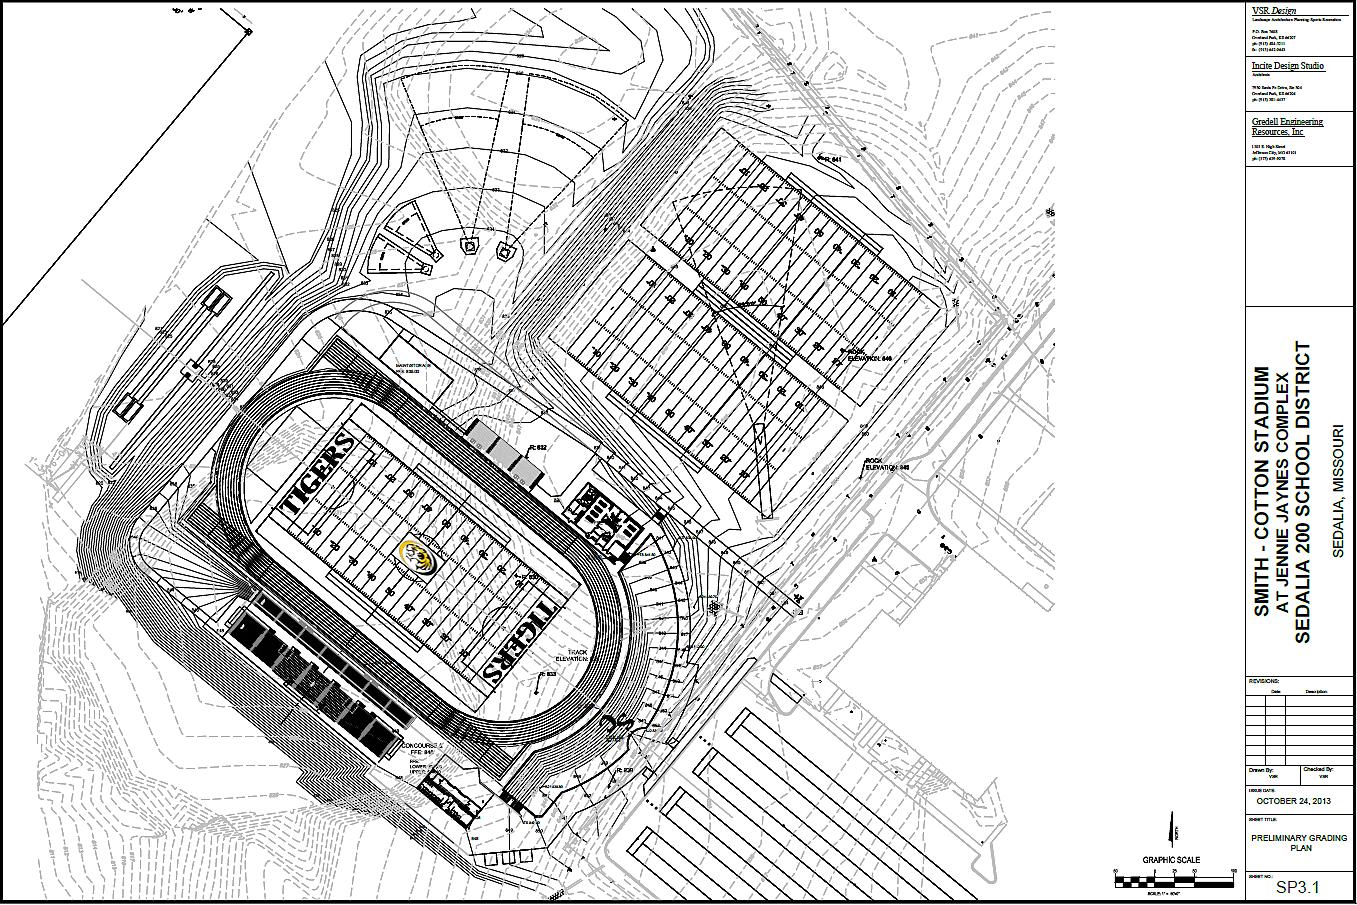 Sedalia 200 school board approves stadium layout design